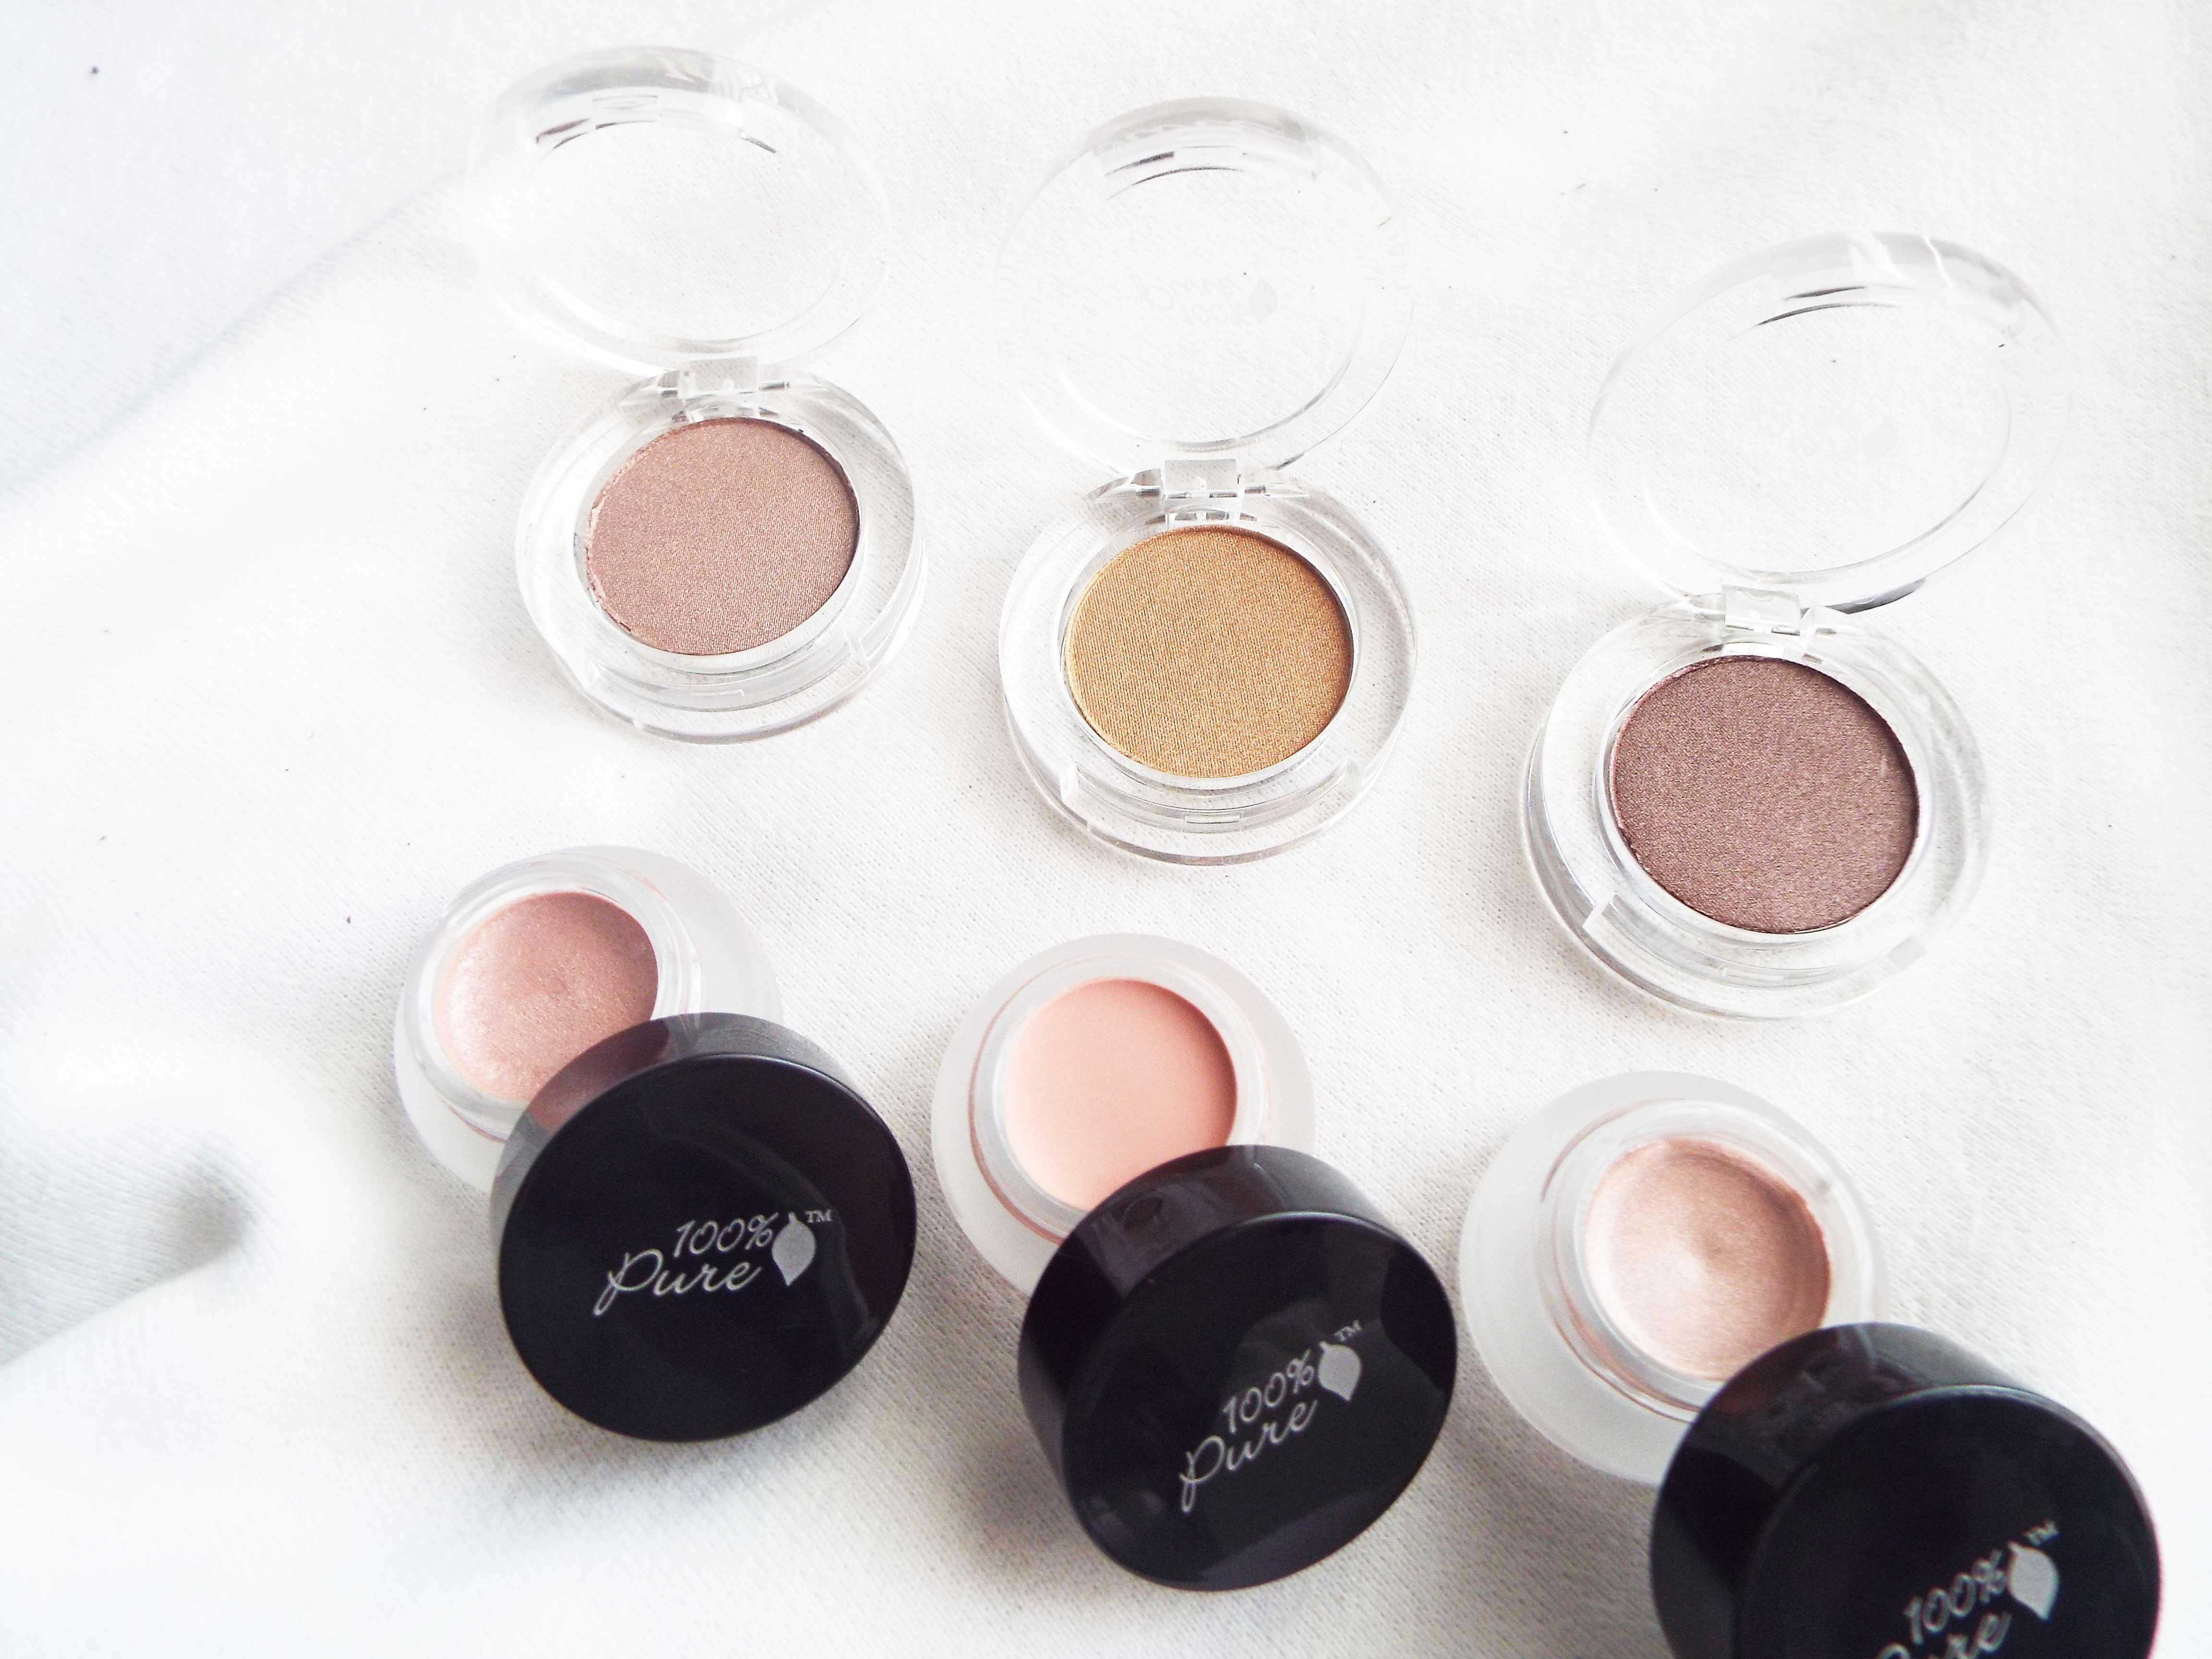 100 Percent Pure Eyeshadows & Blushes Organic Beauty